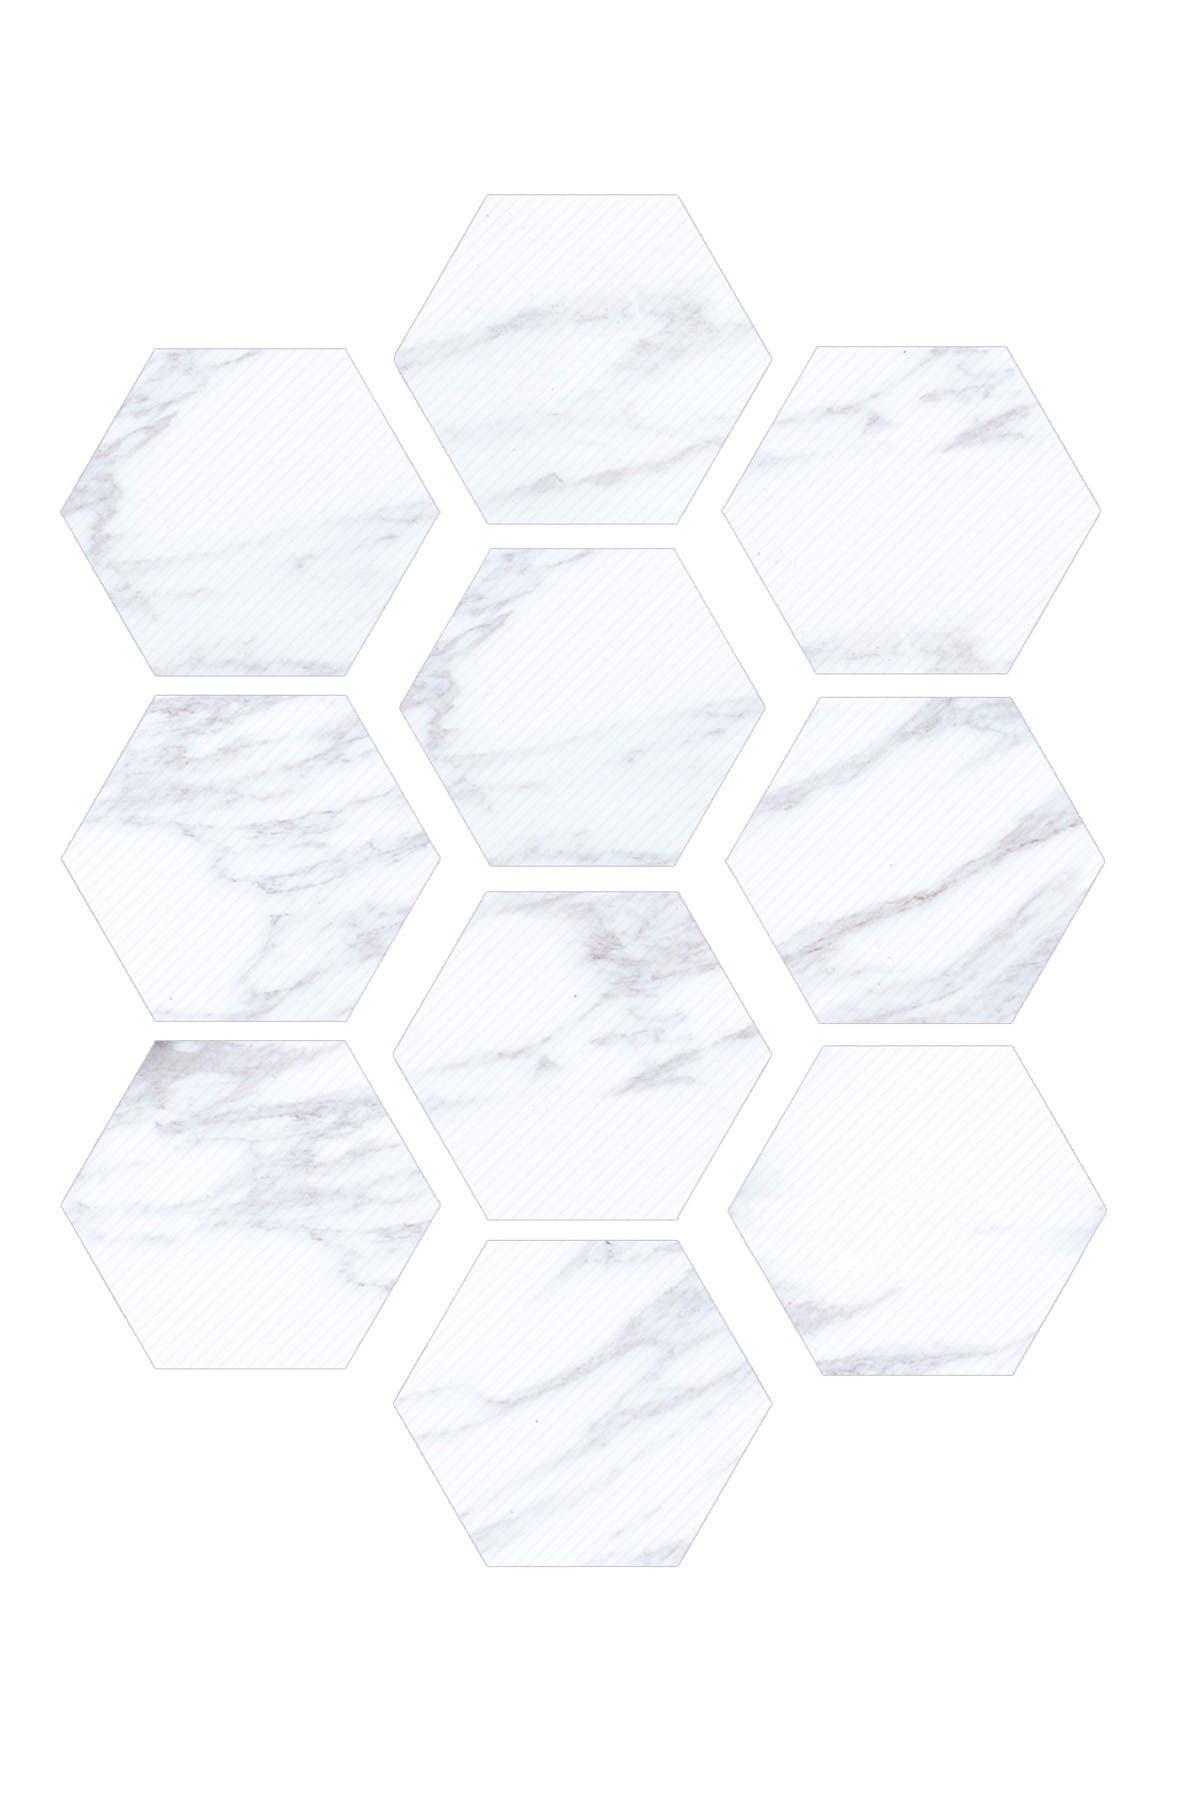 Image of WalPlus White Marble Hexagon Floor Tiles Stickers